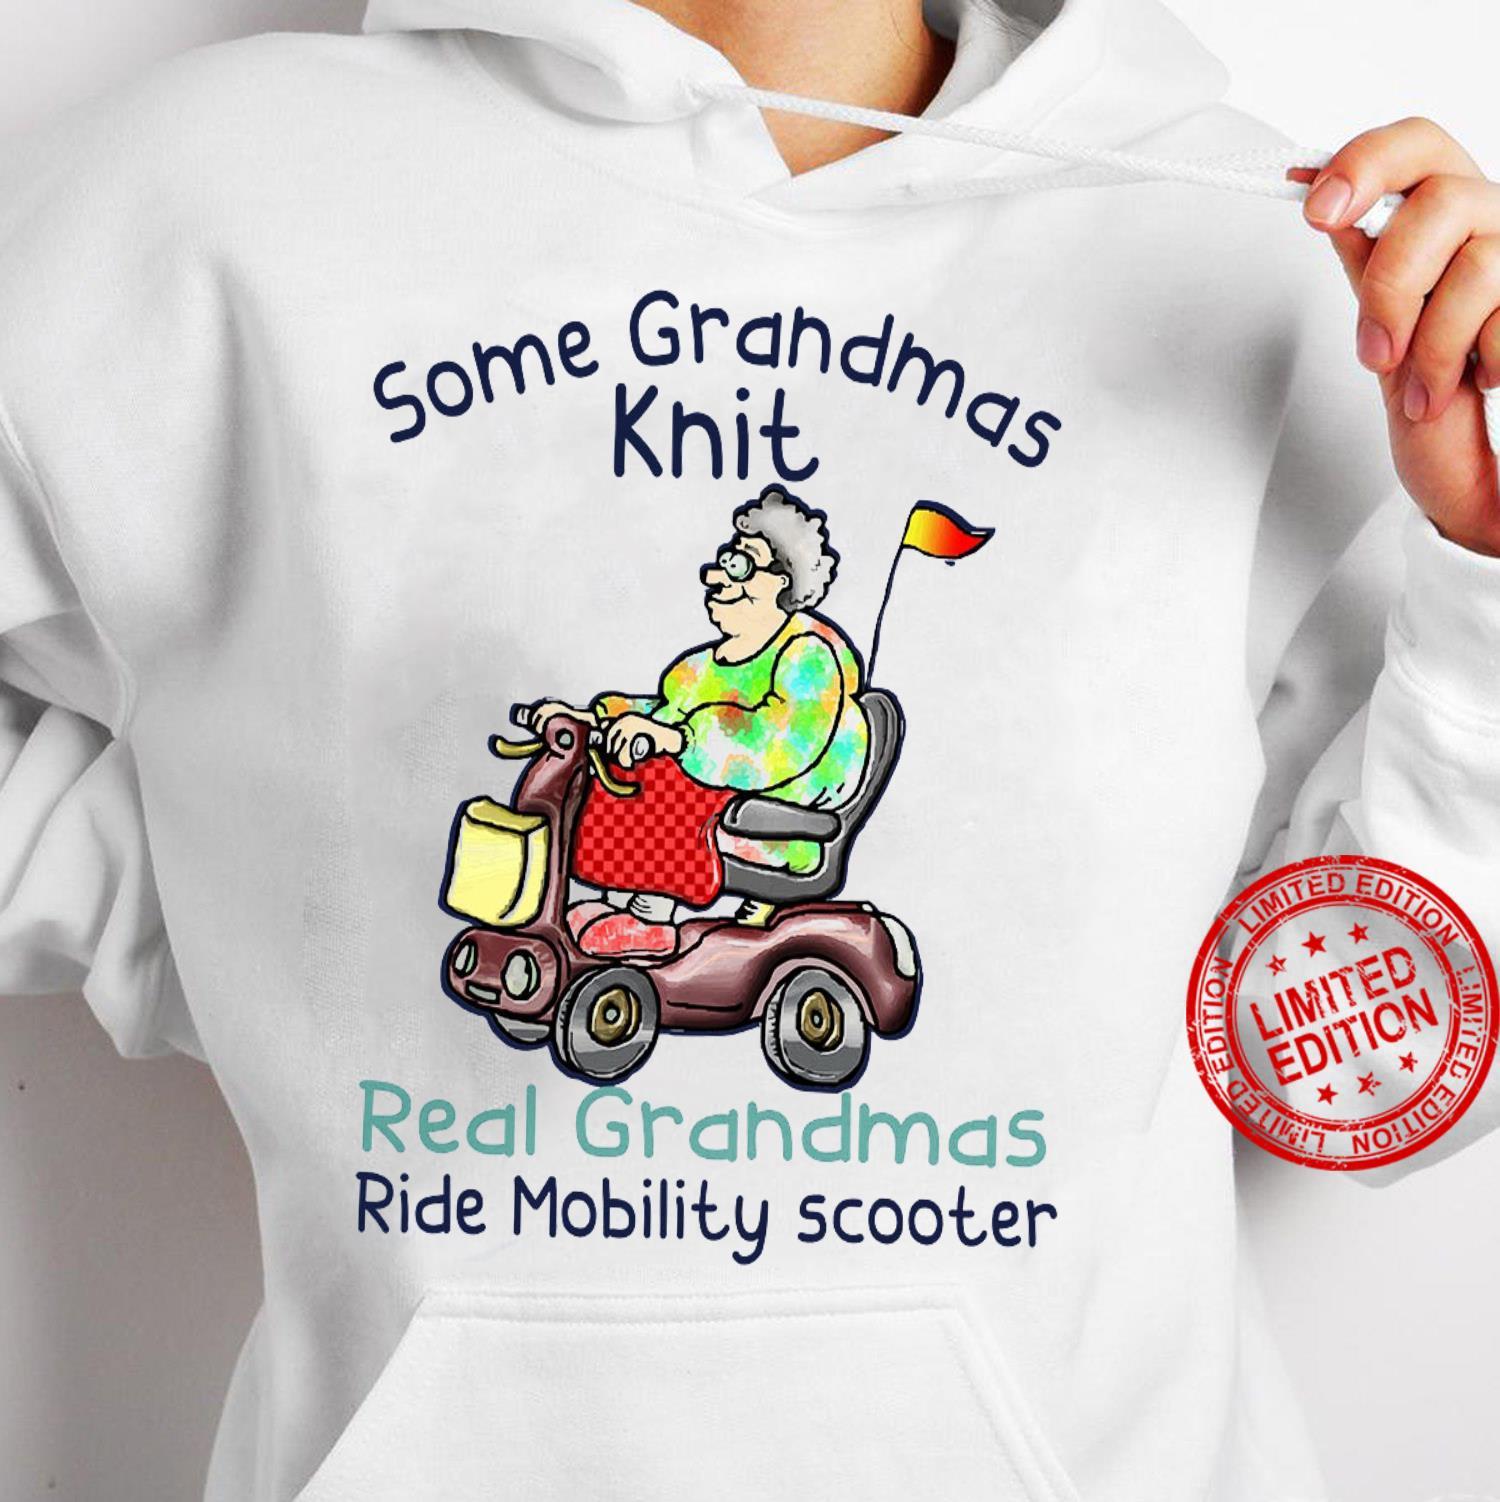 Some Grandmas Knit Real Grandmas Ride Mobility Scooter Shirt hoodie